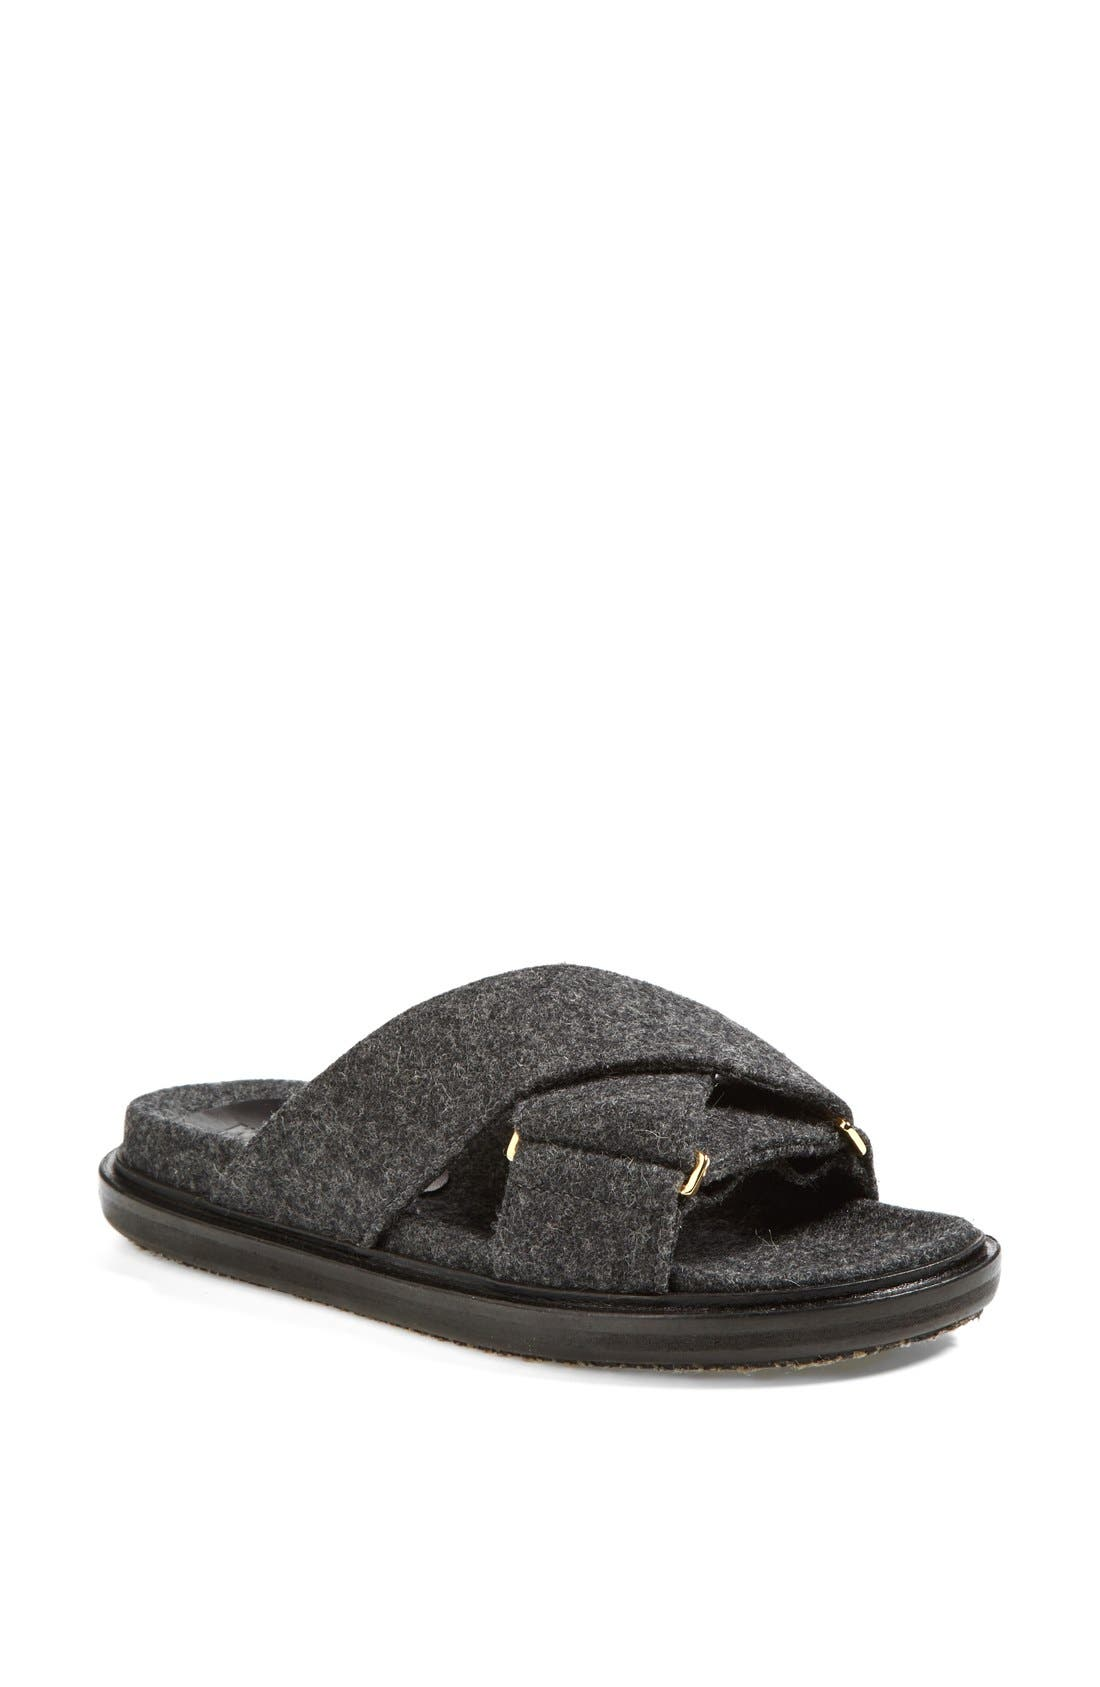 Alternate Image 1 Selected - Marni Flannel Sandal